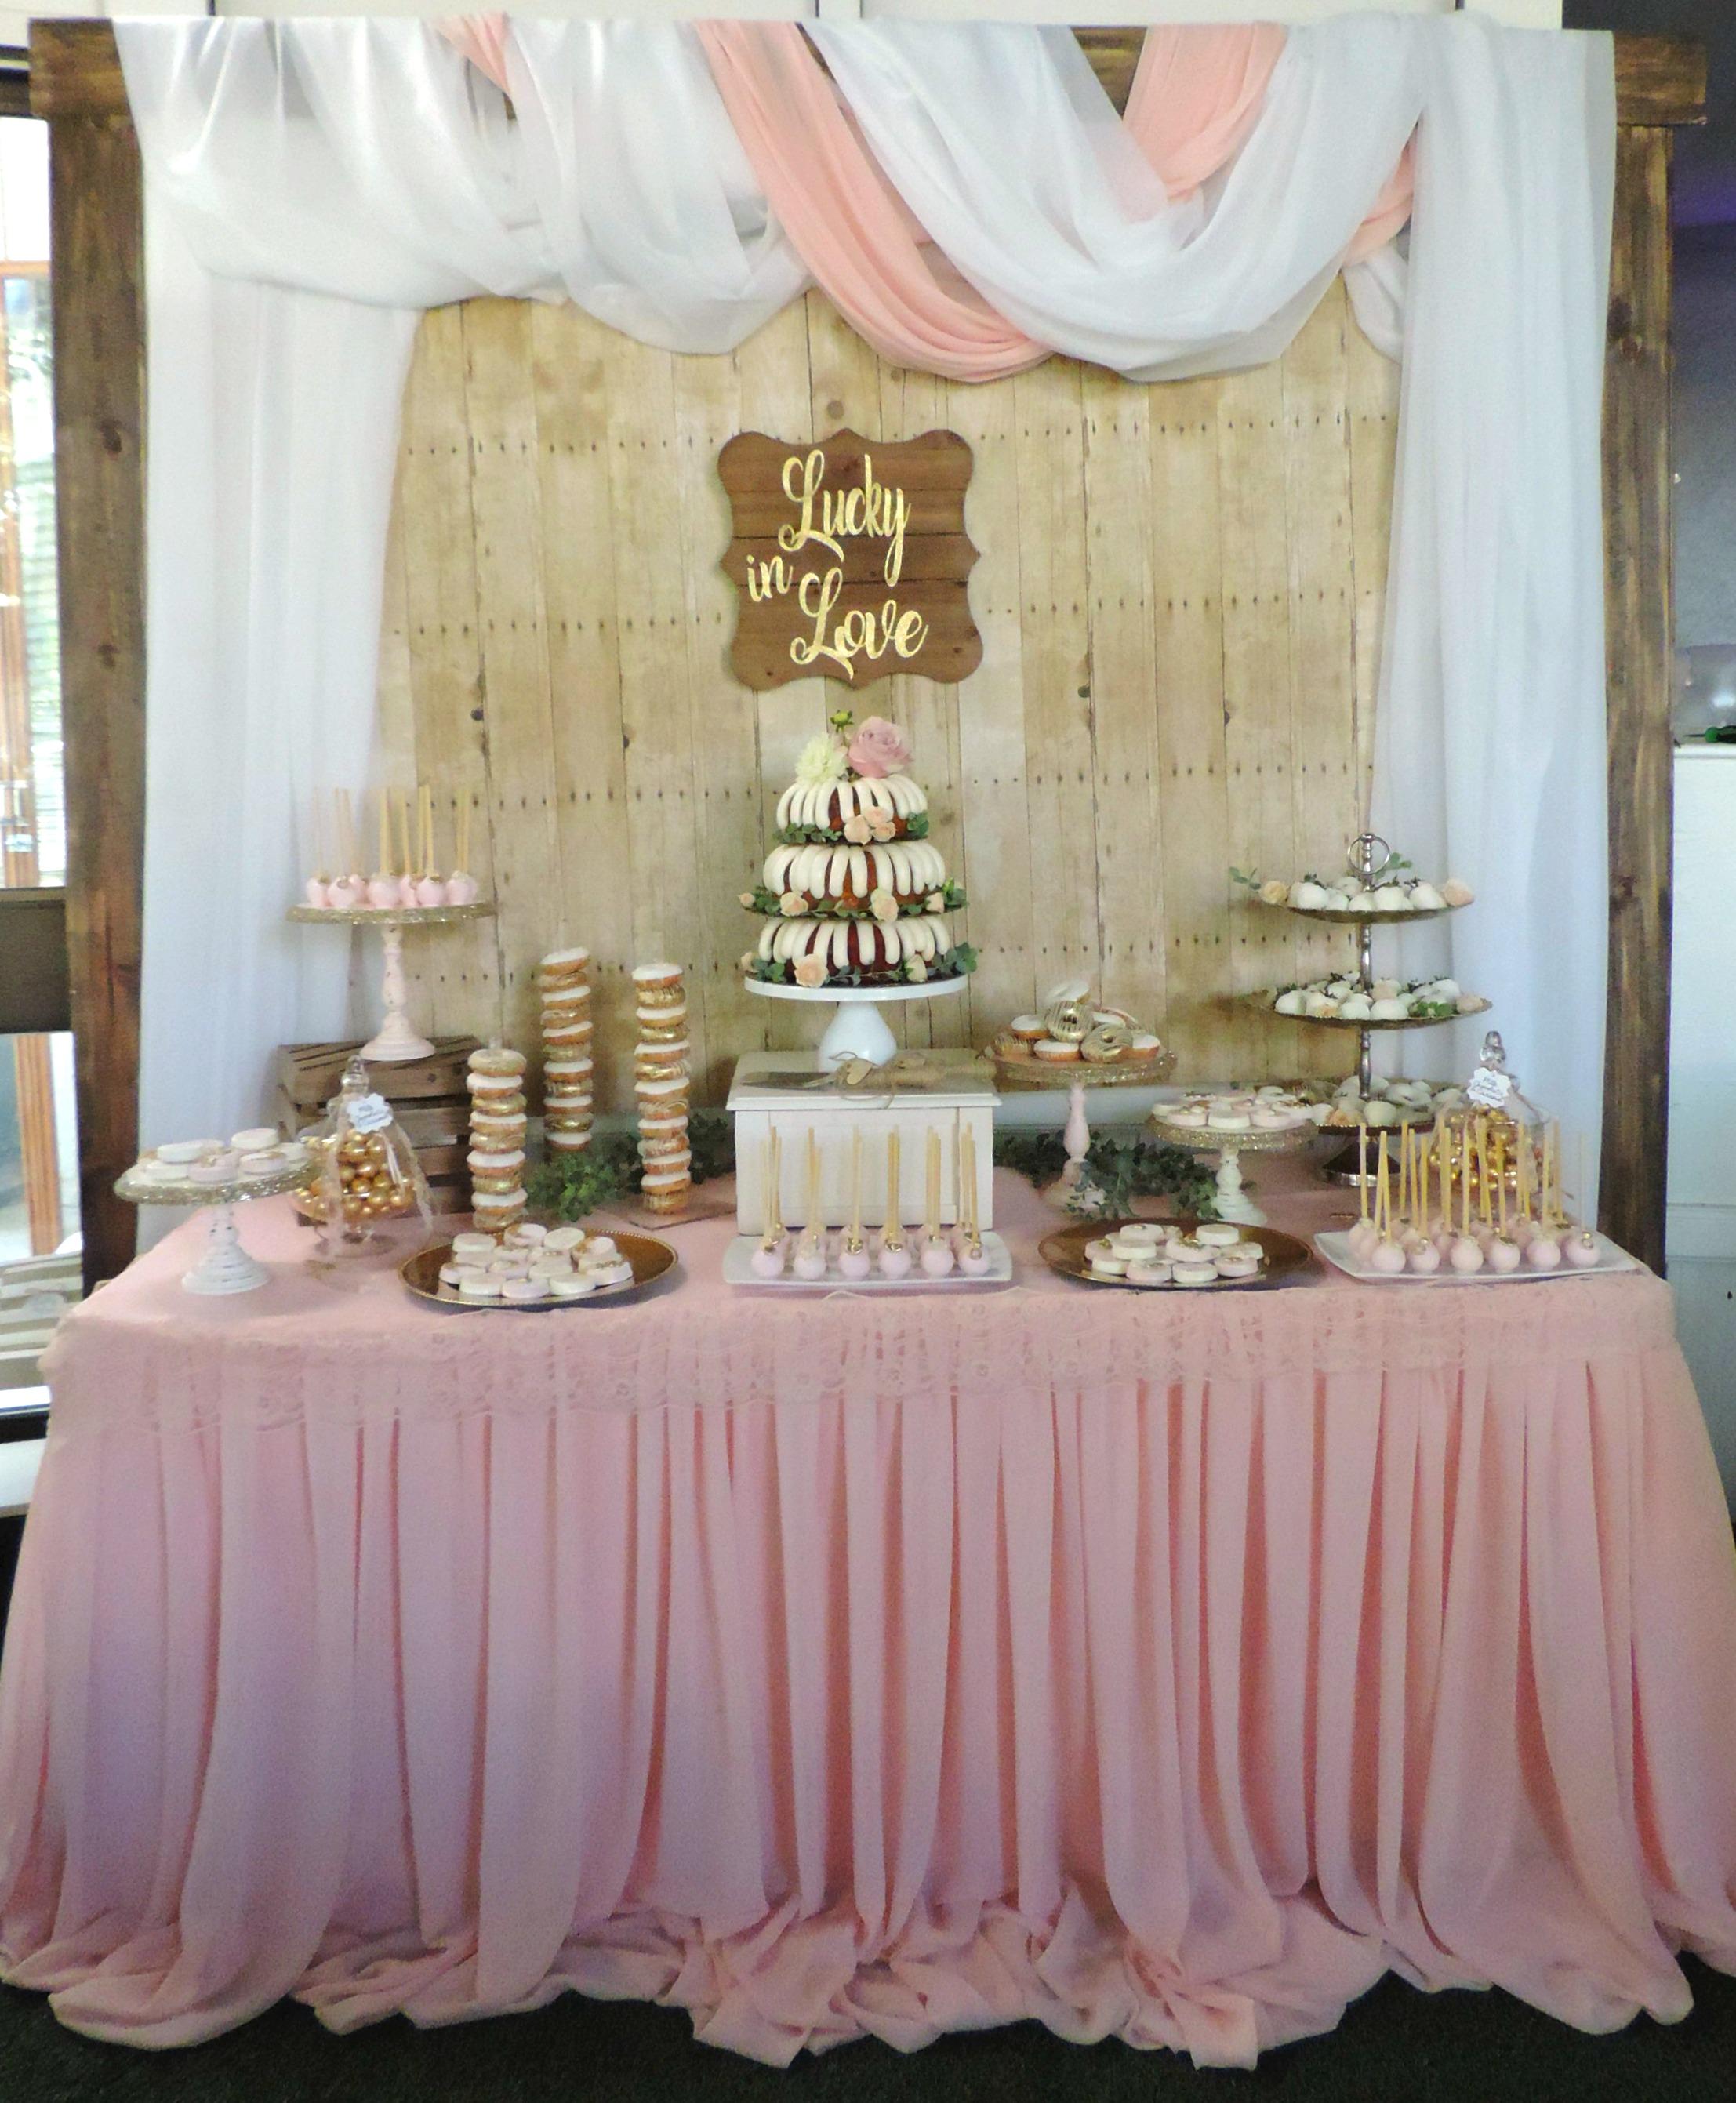 Rustic Wedding-Lucky In Love-Blush Pink Wedding-Wedding-www.SugarPartiesLA.com.jpg